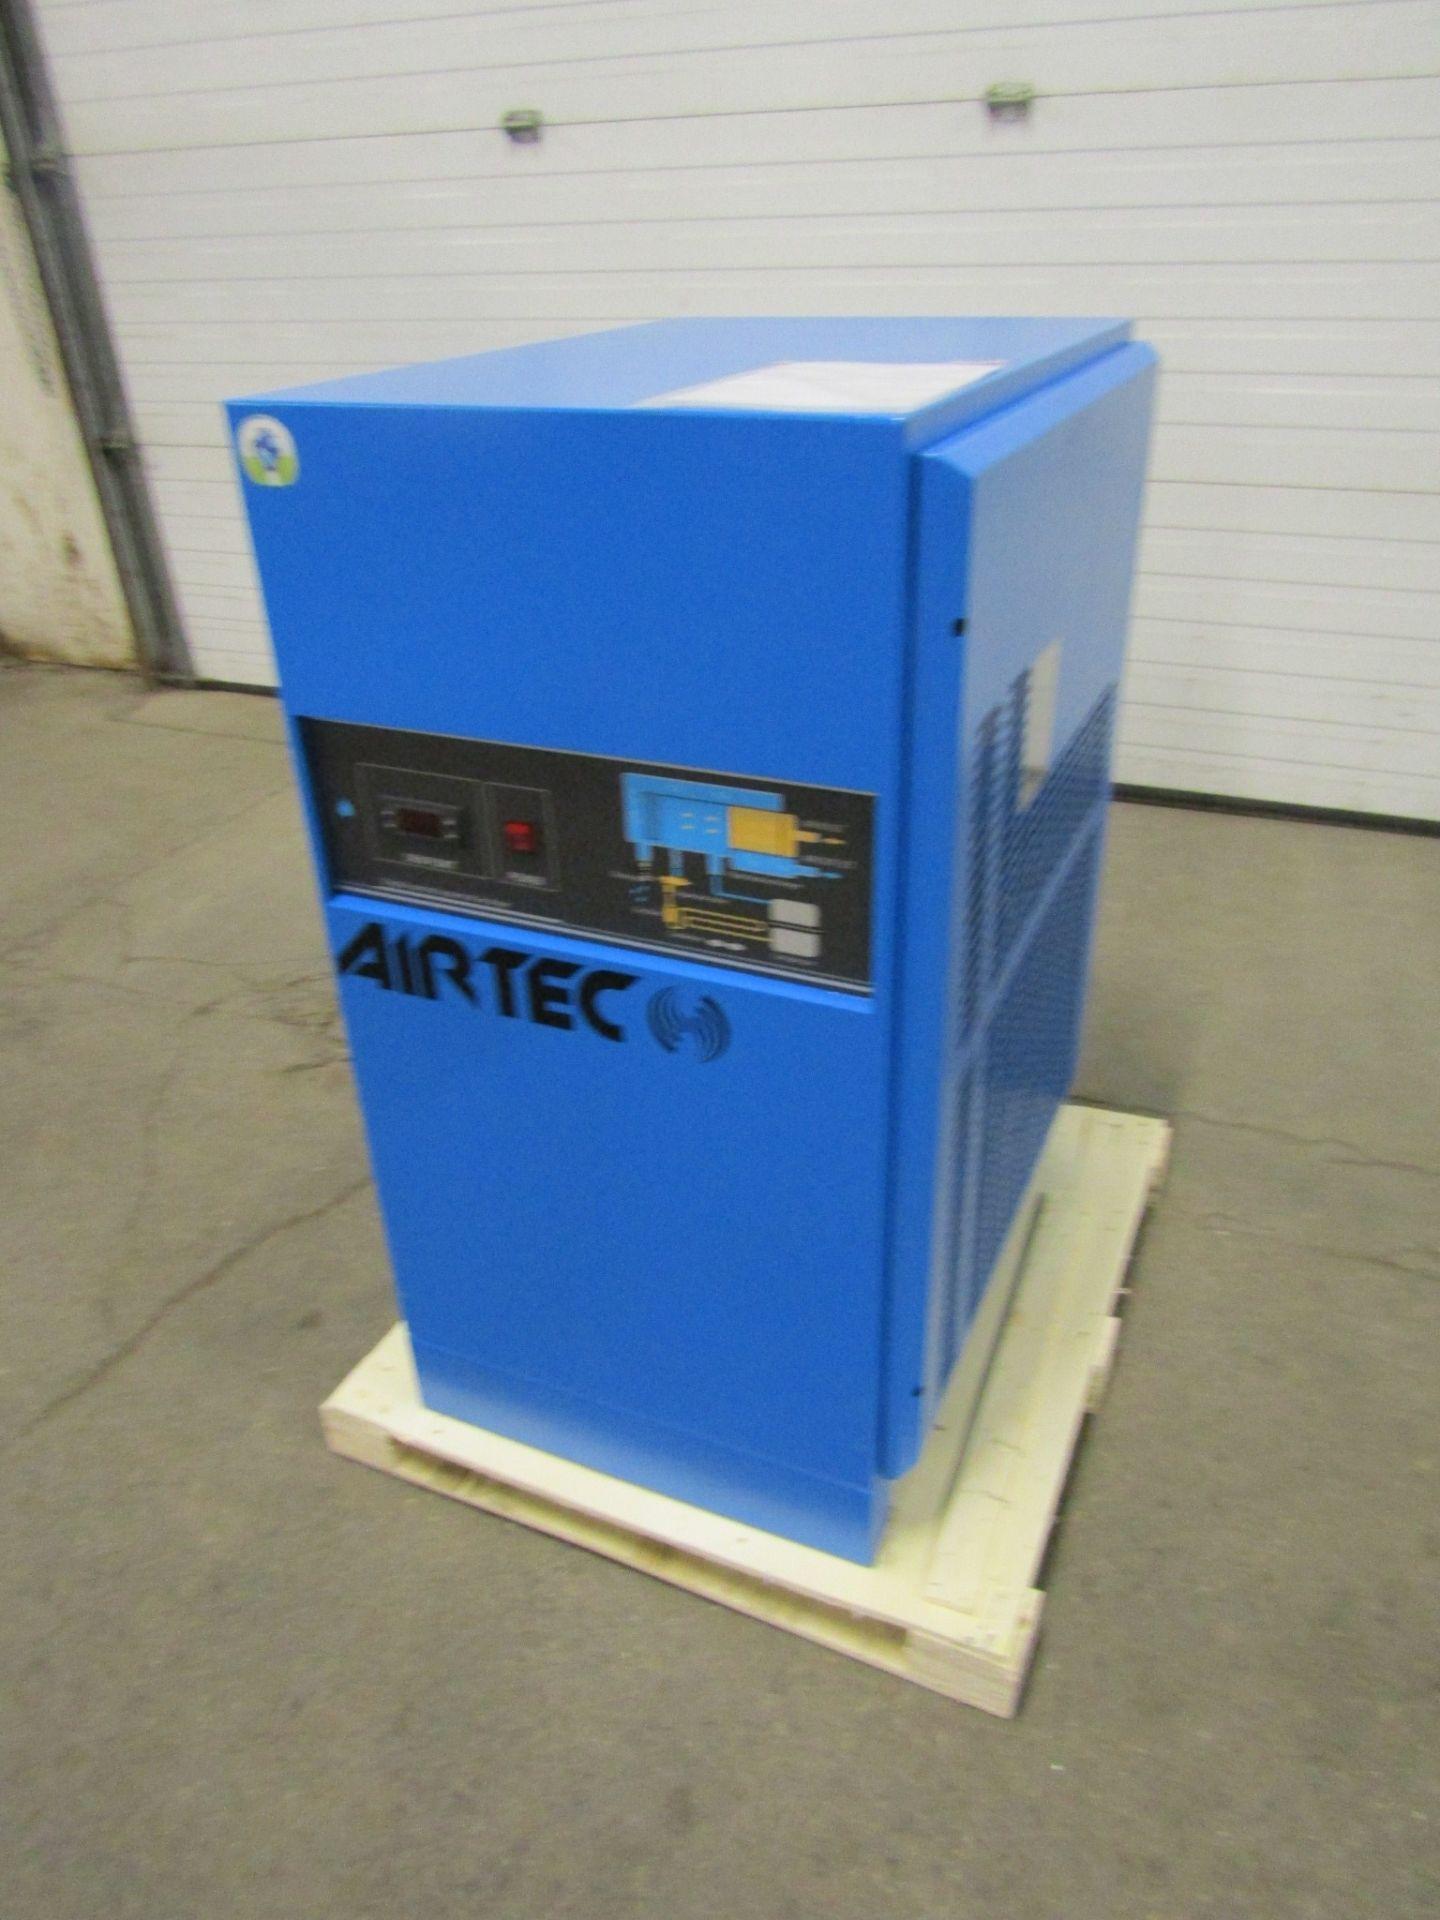 MINT Airtec Compressed Air Dryer 229 CFM - 50HP Unused new unit